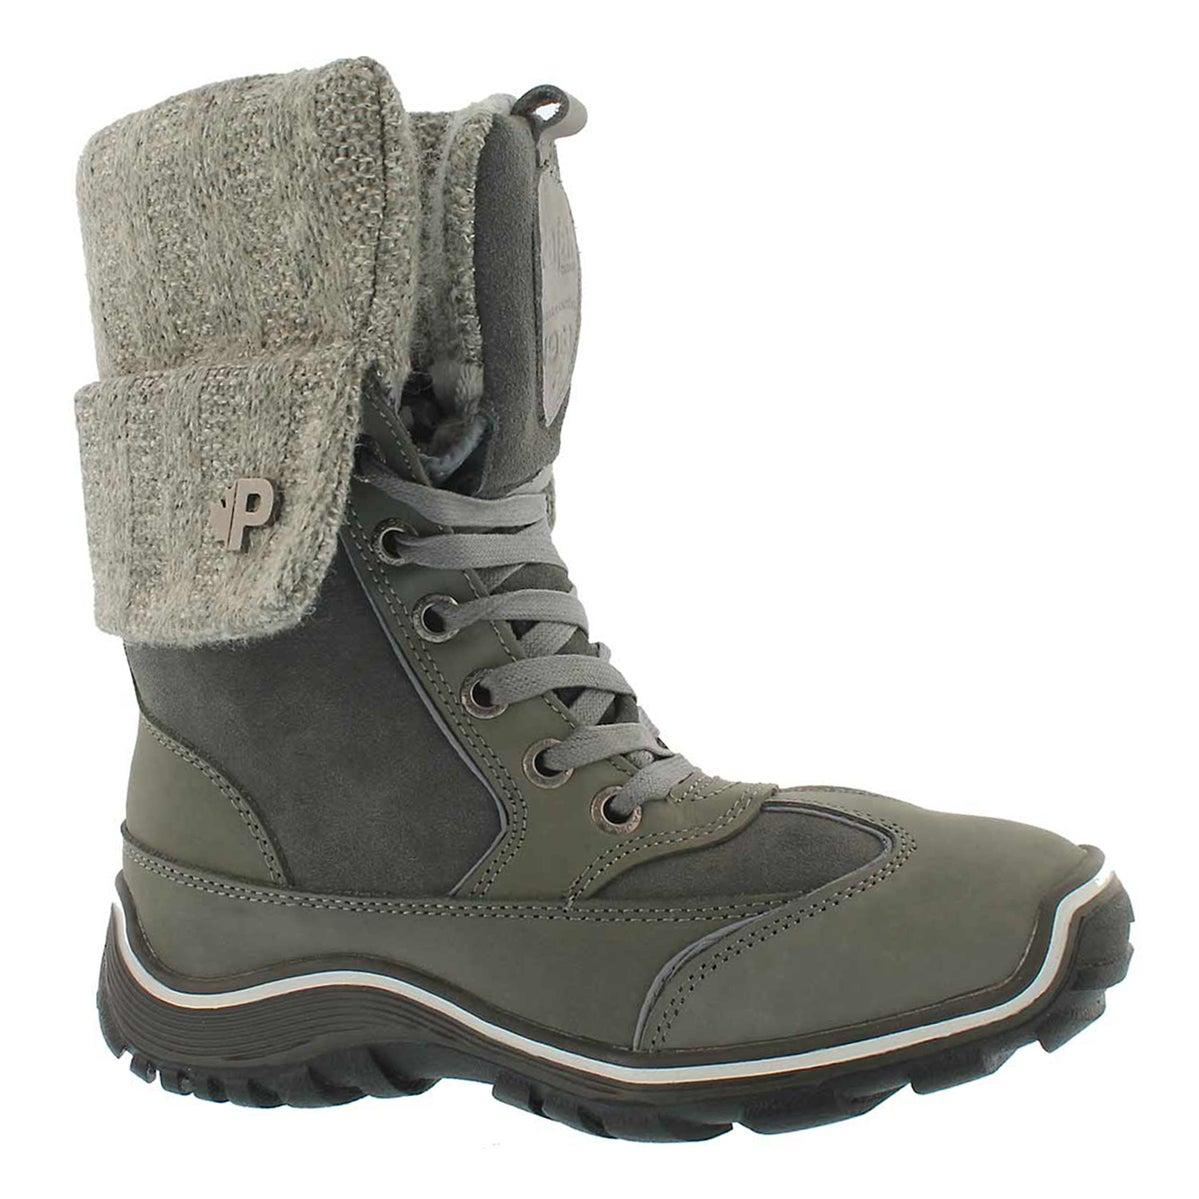 Lds Ava grey wtpf winter boot